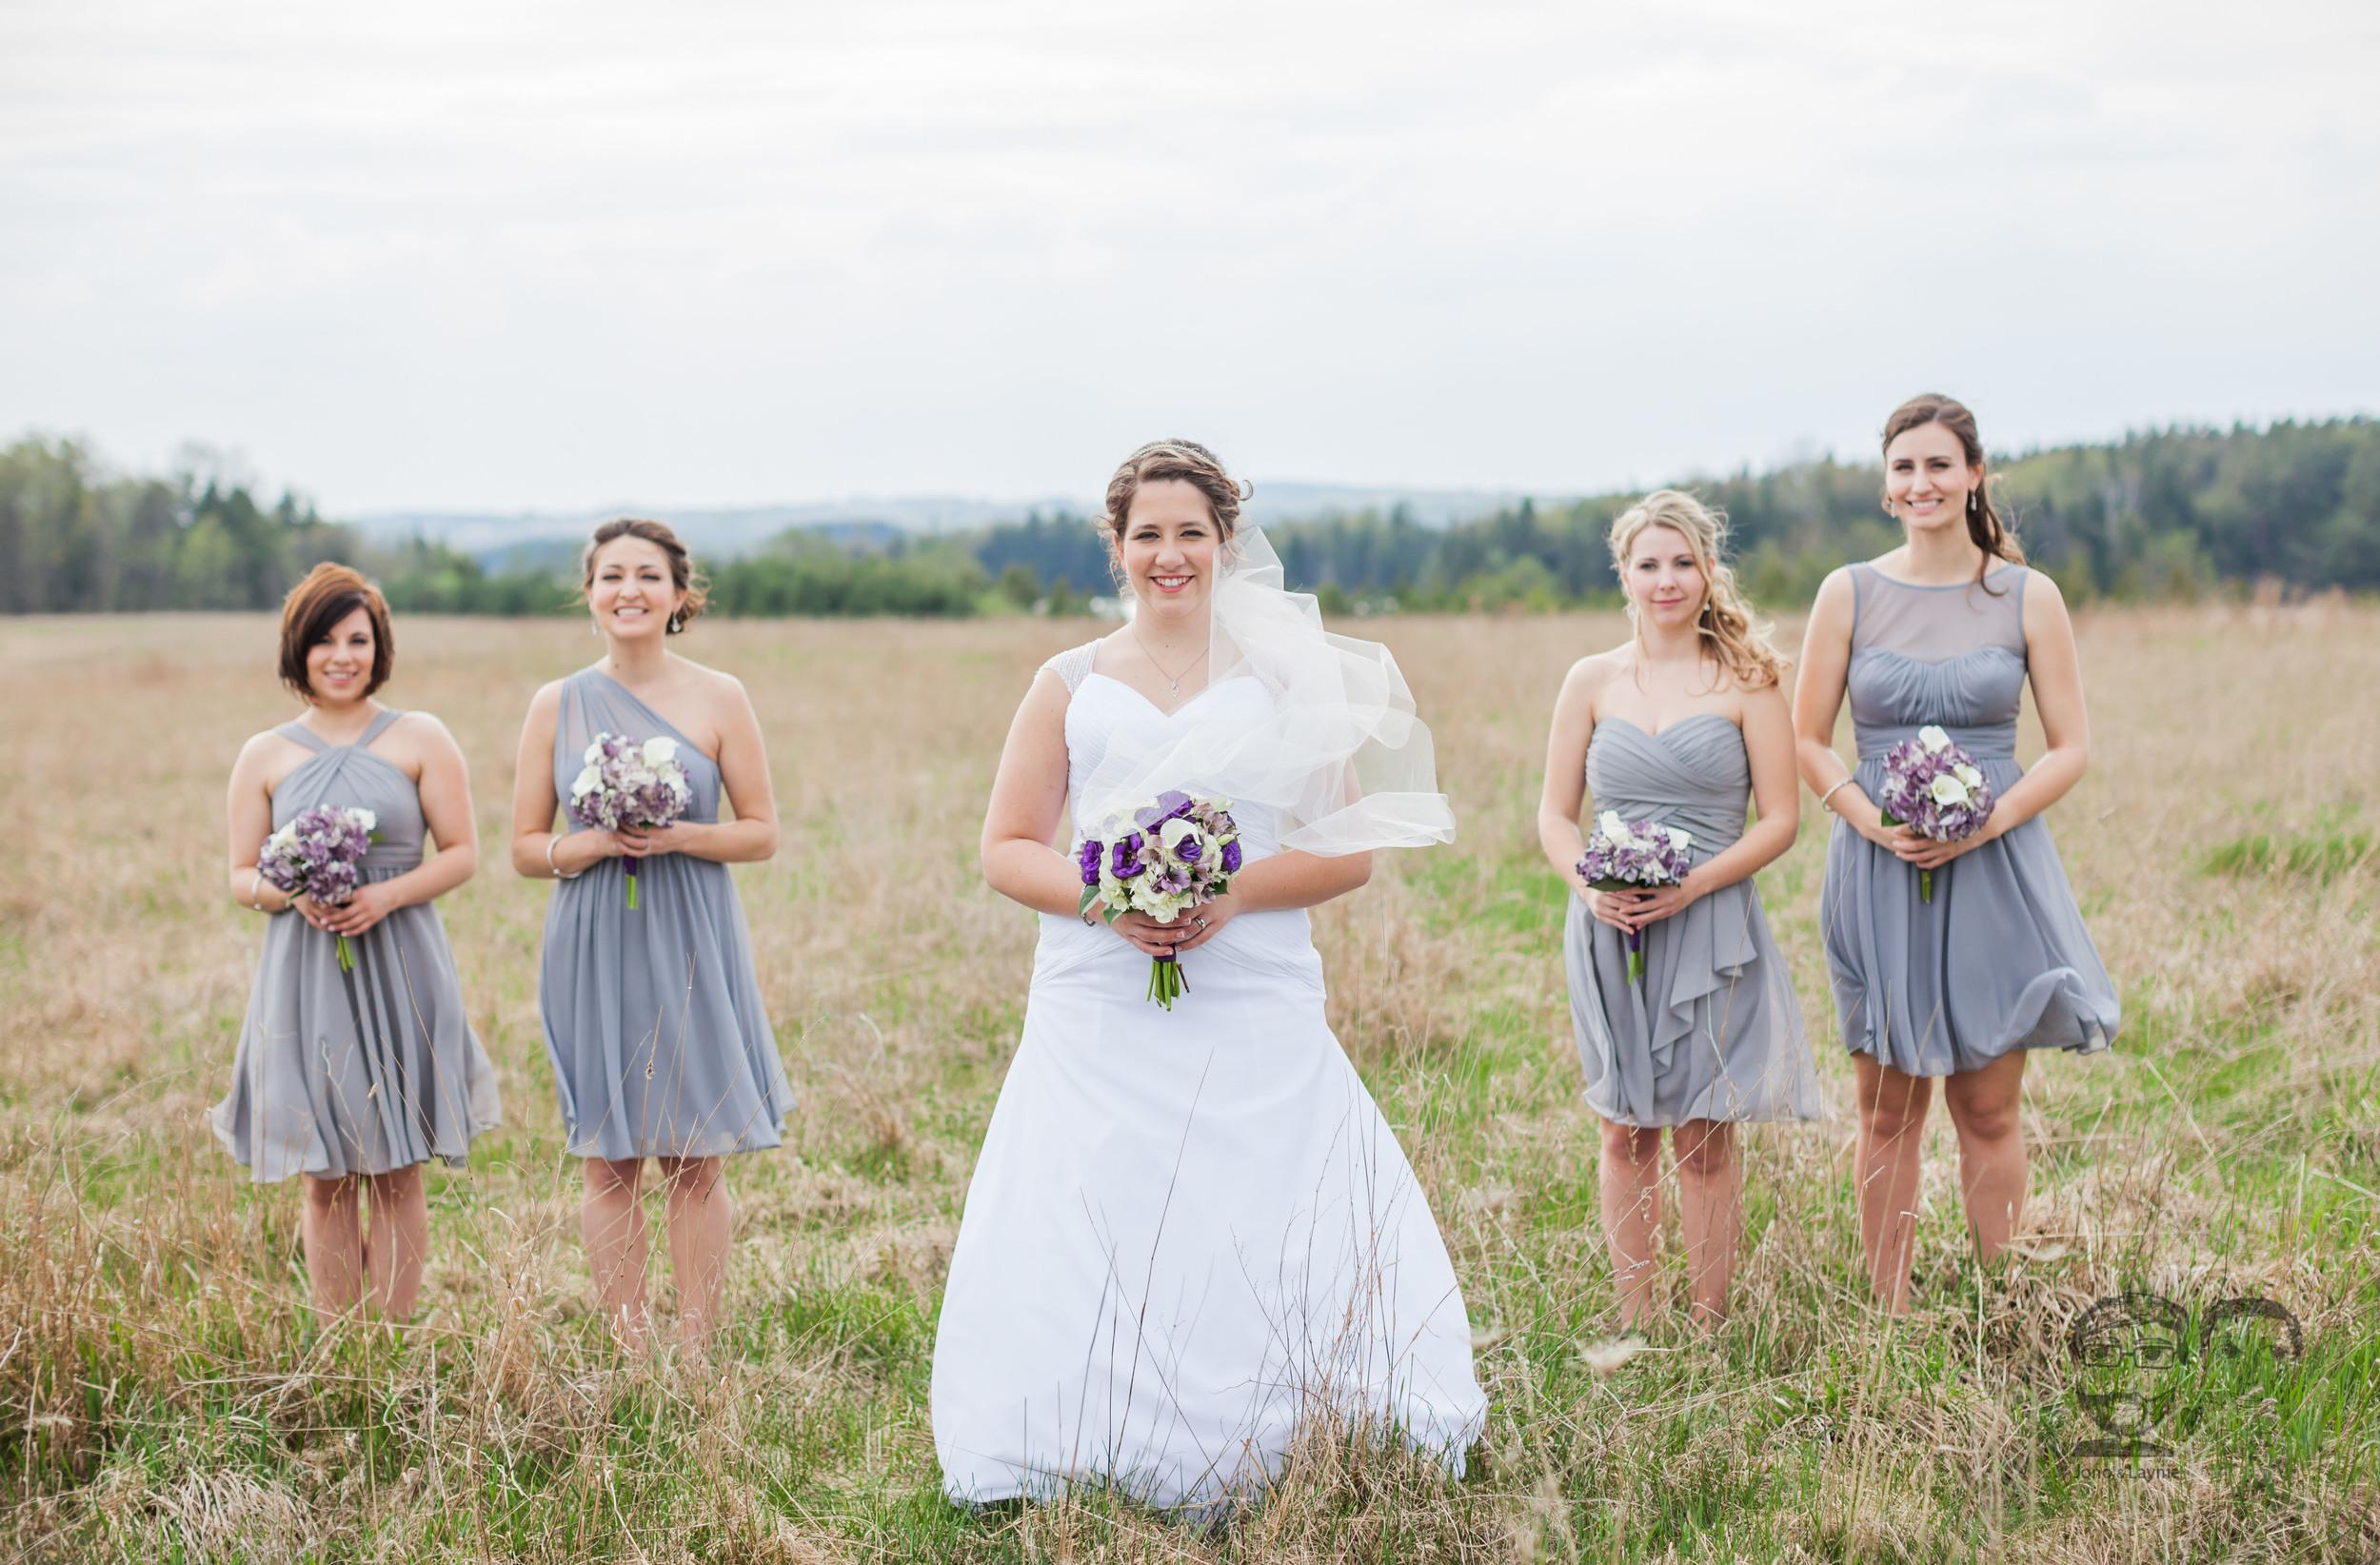 47Toronto Wedding Photographers and Videographers-Jono & Laynie Co.-Orangeville Wedding.jpg